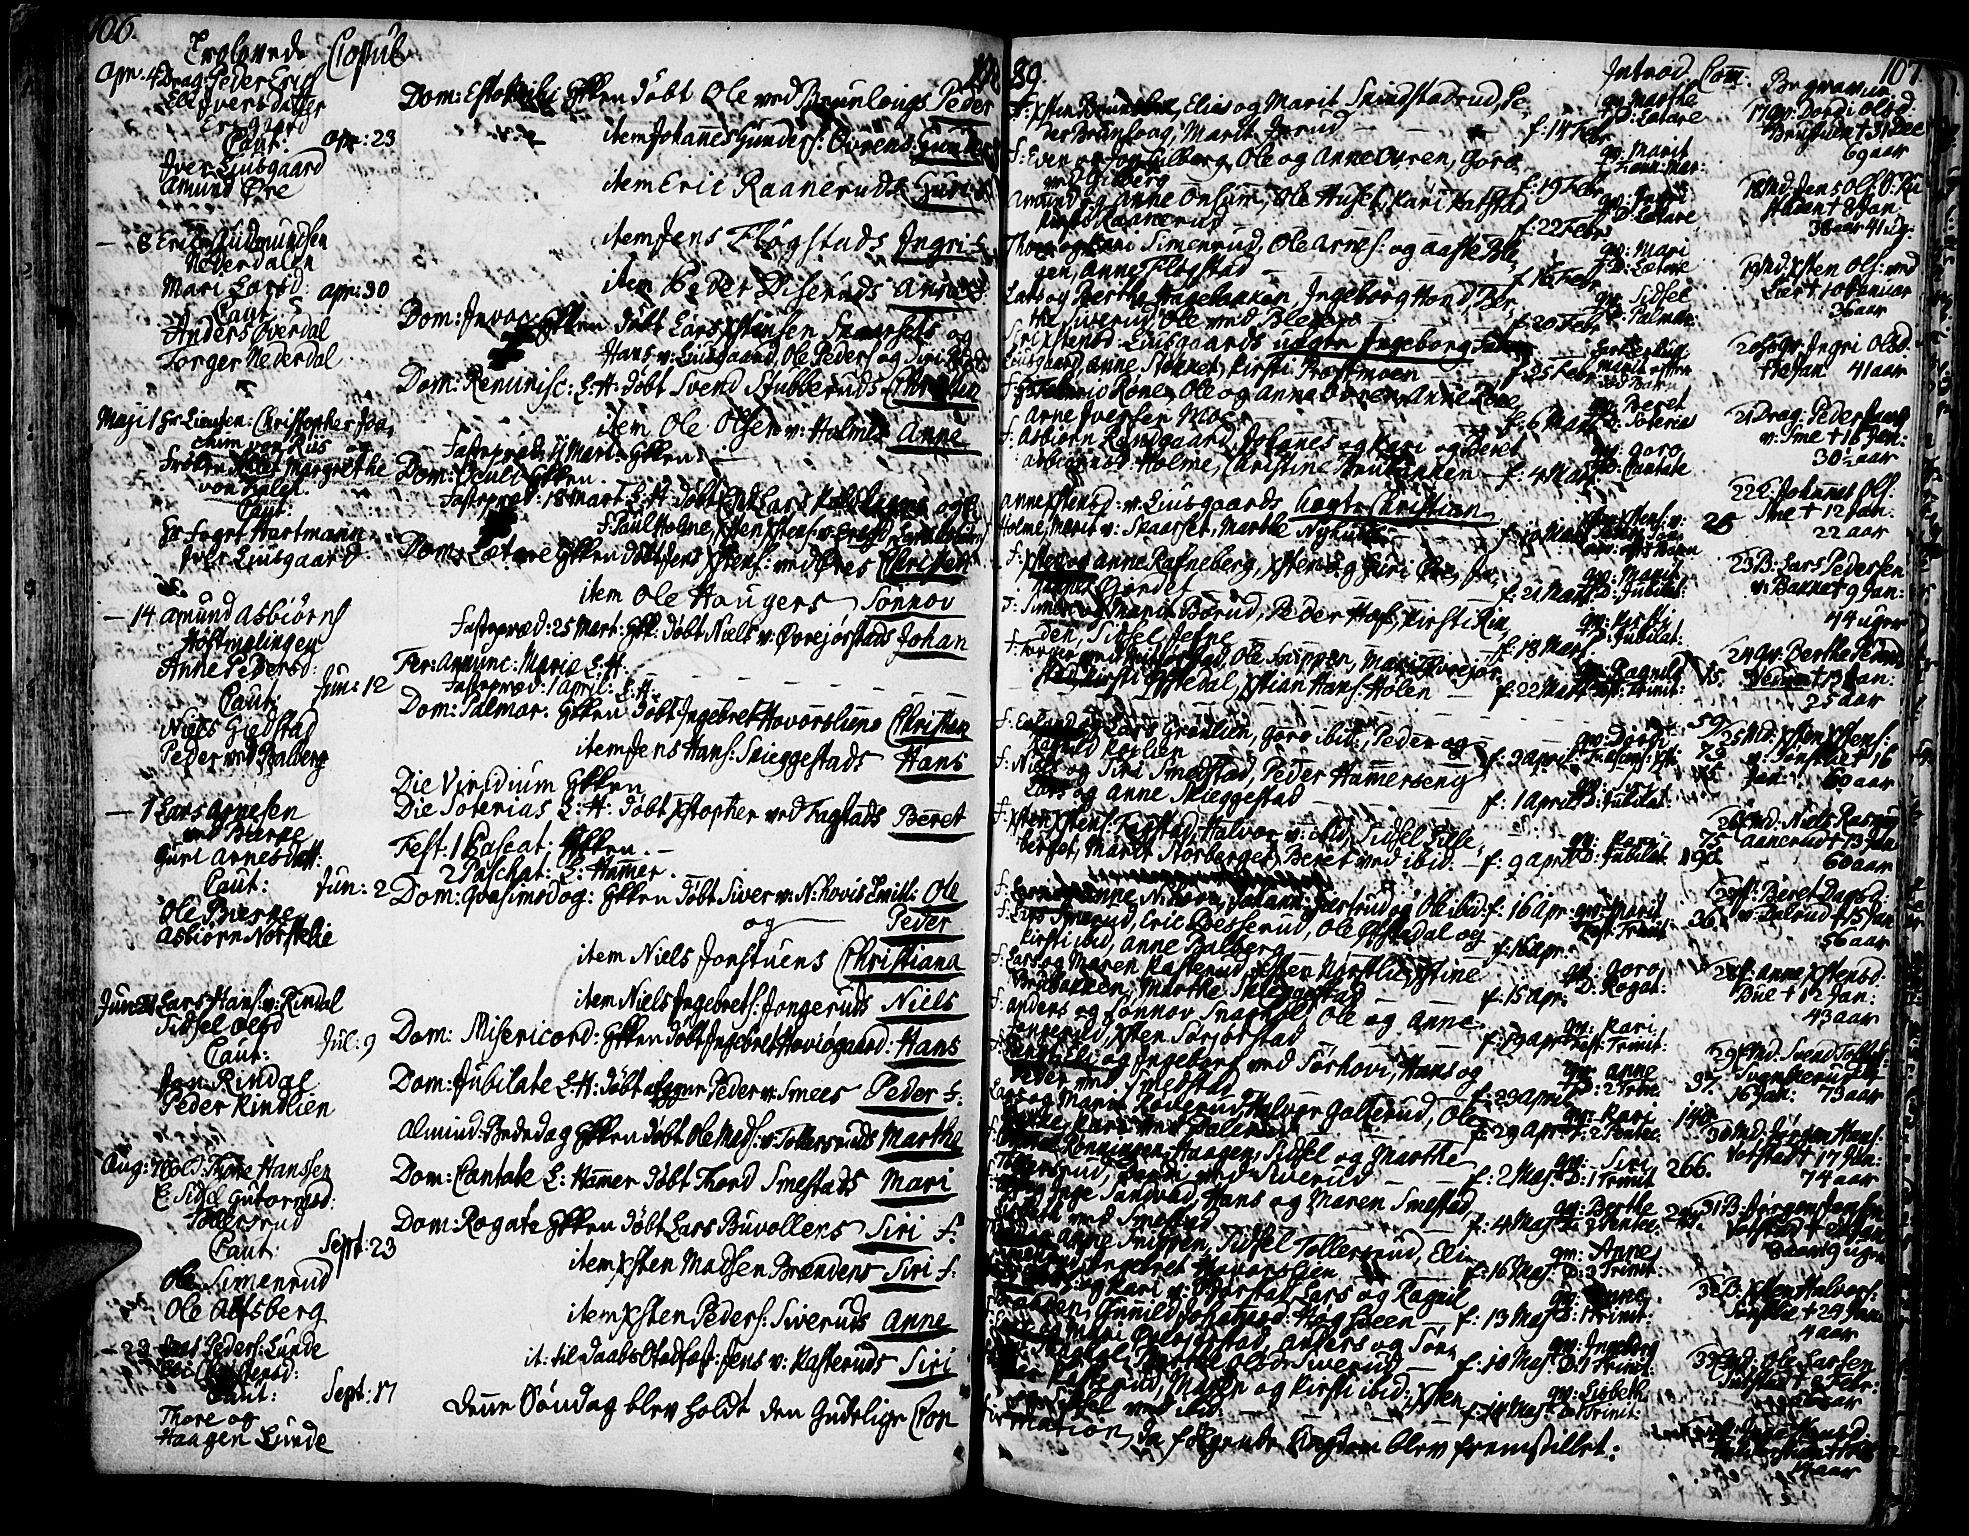 SAH, Fåberg prestekontor, H/Ha/Haa/L0002: Ministerialbok nr. 2, 1775-1818, s. 106-107